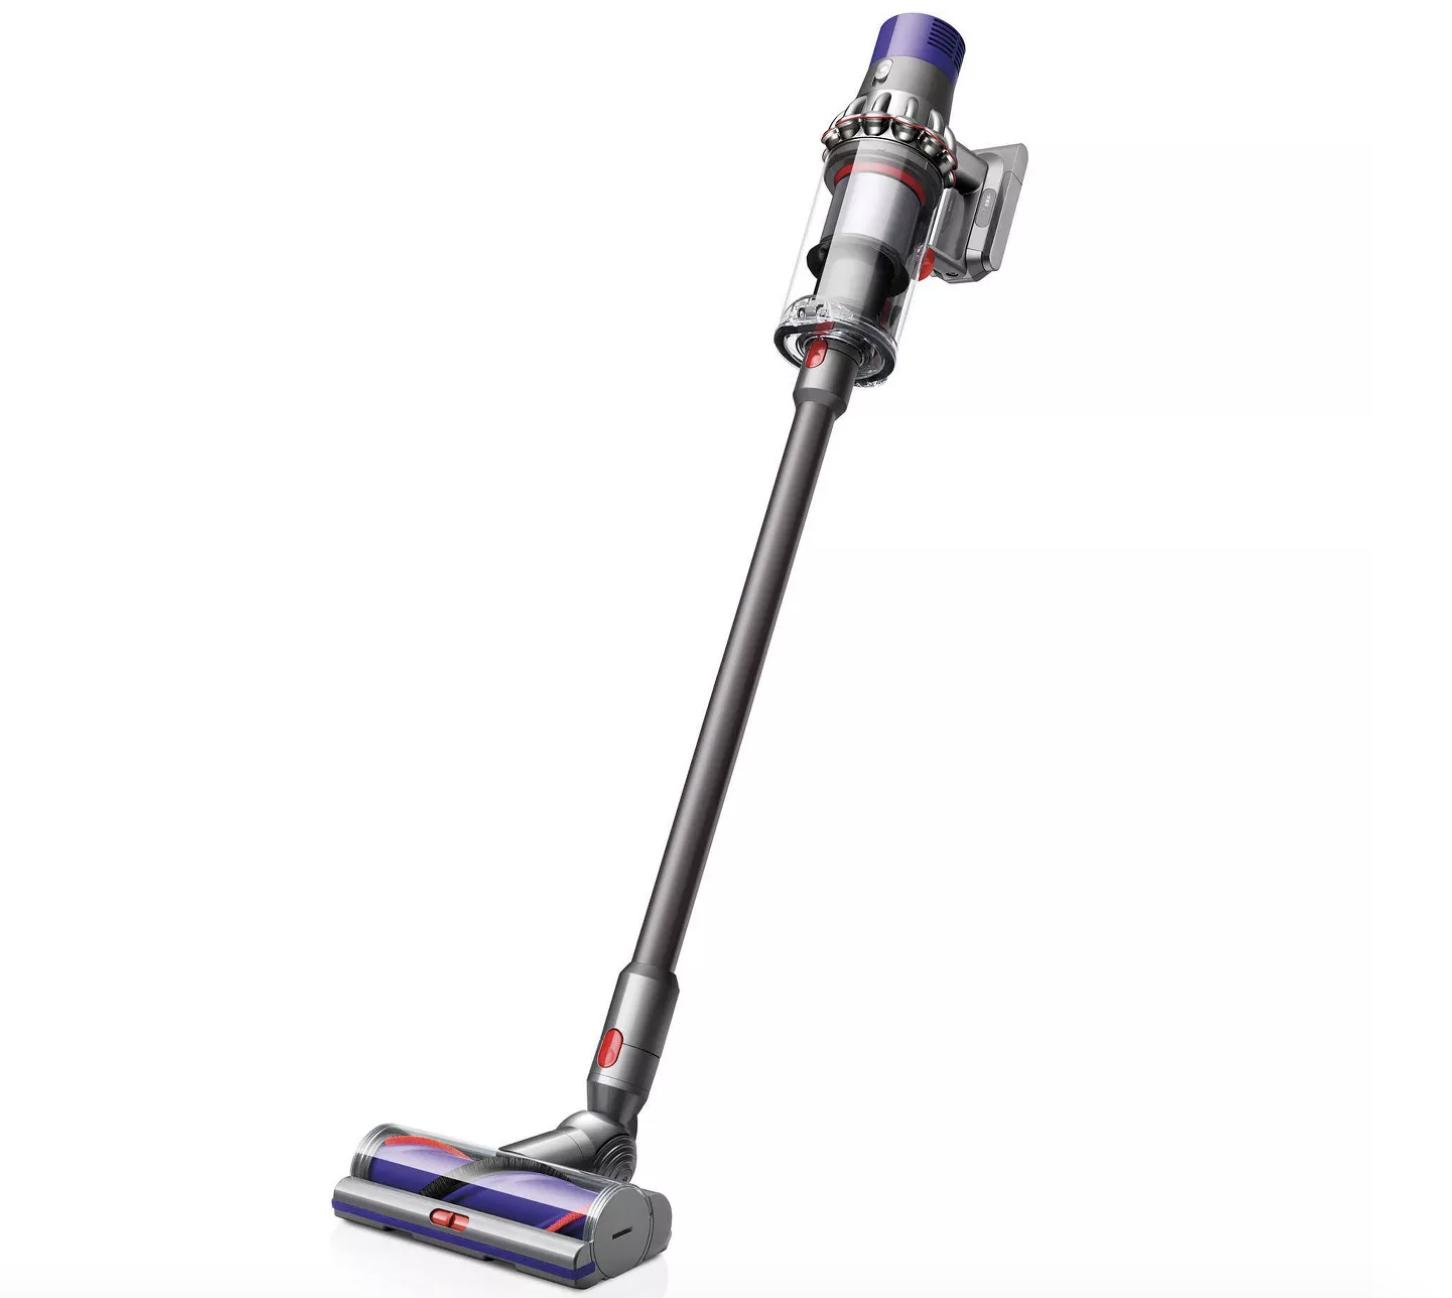 the dyson v10 animal cordless stick vacuum